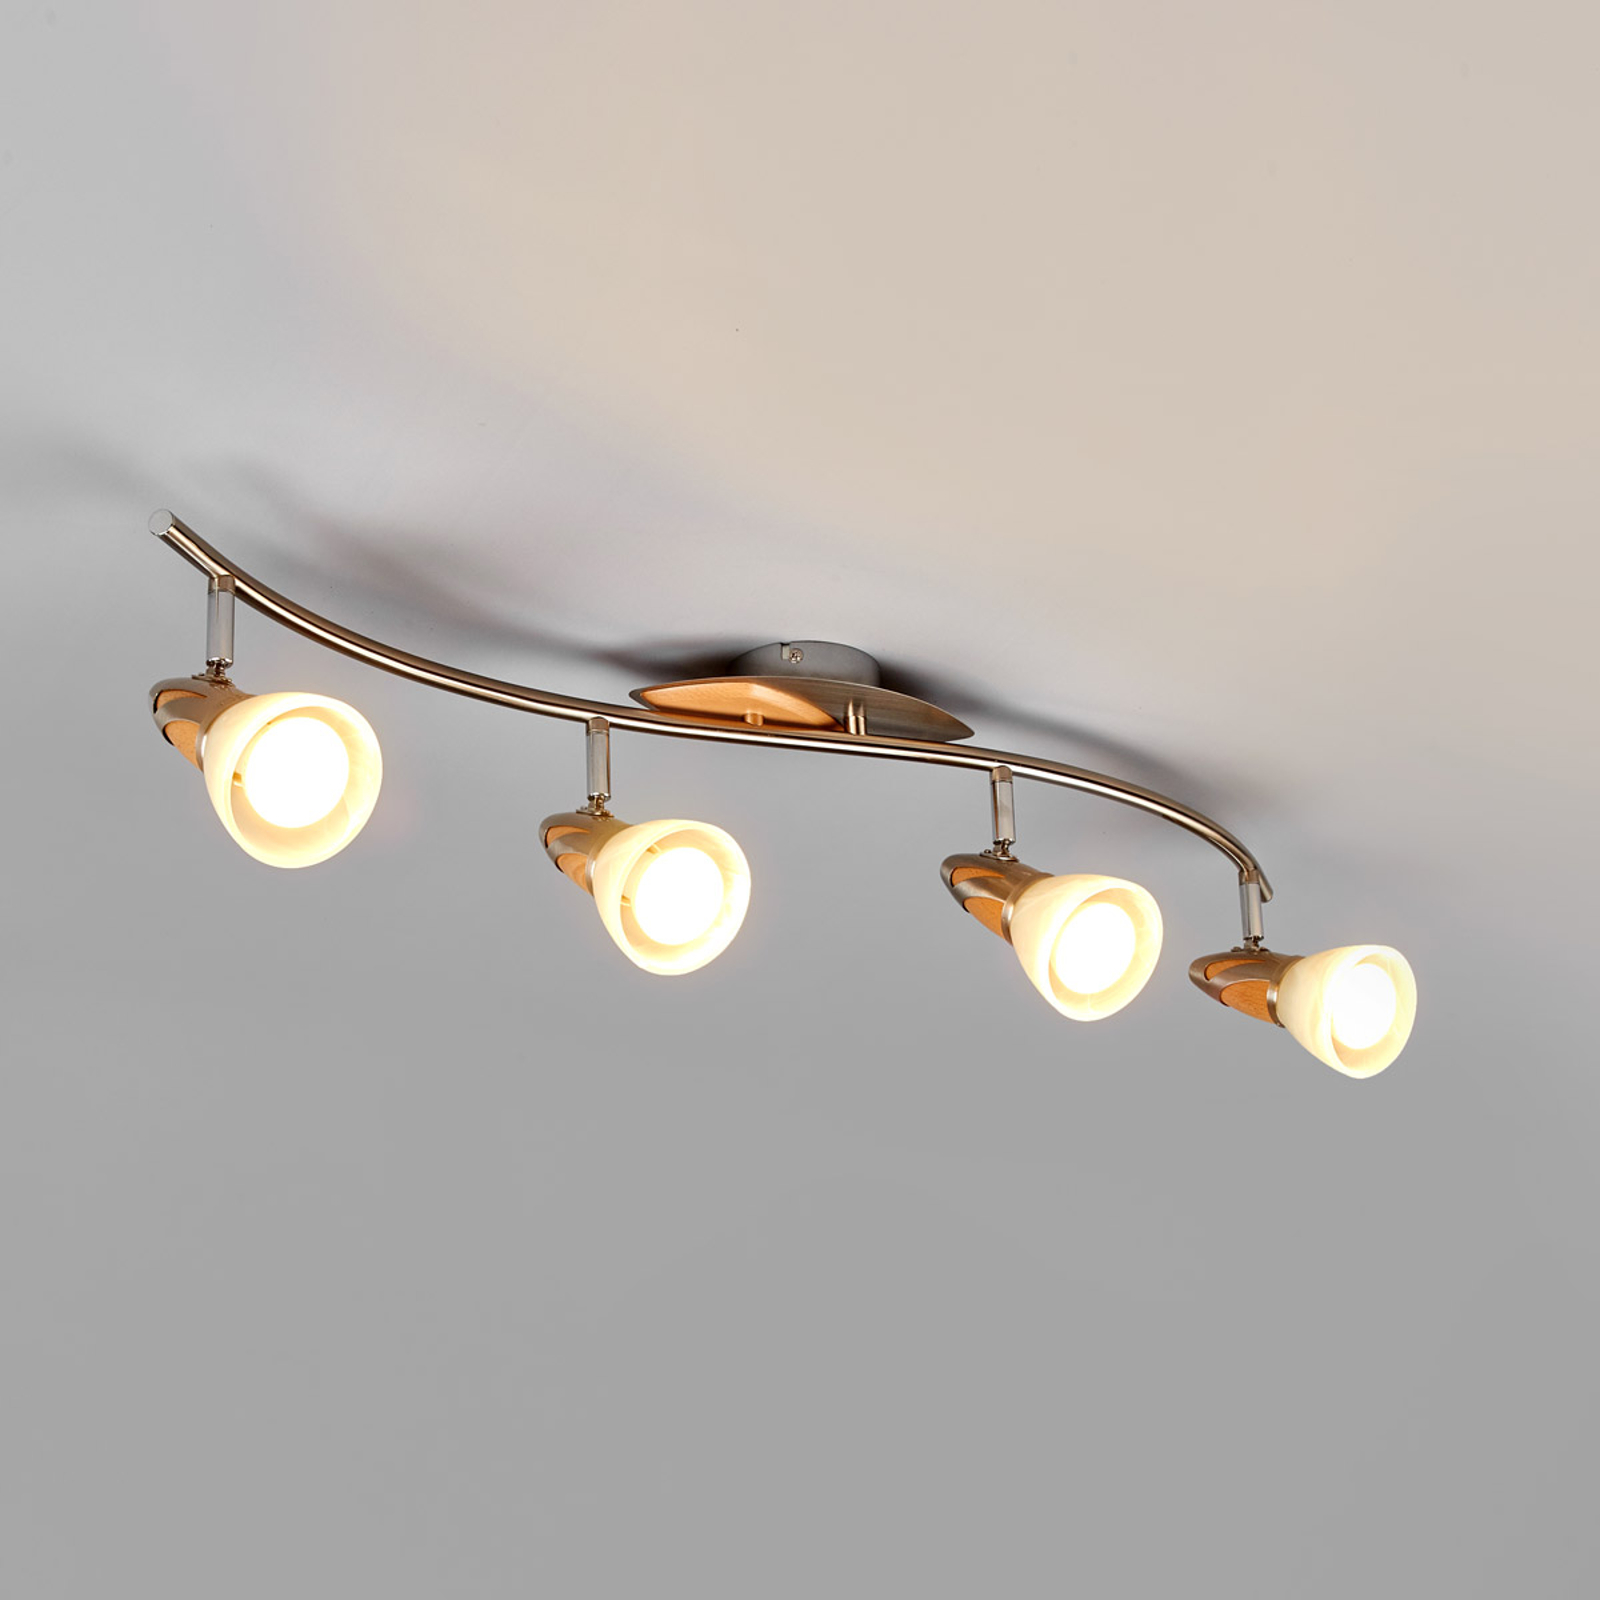 4-flammige Holz-Deckenlampe Marena, E14 LED